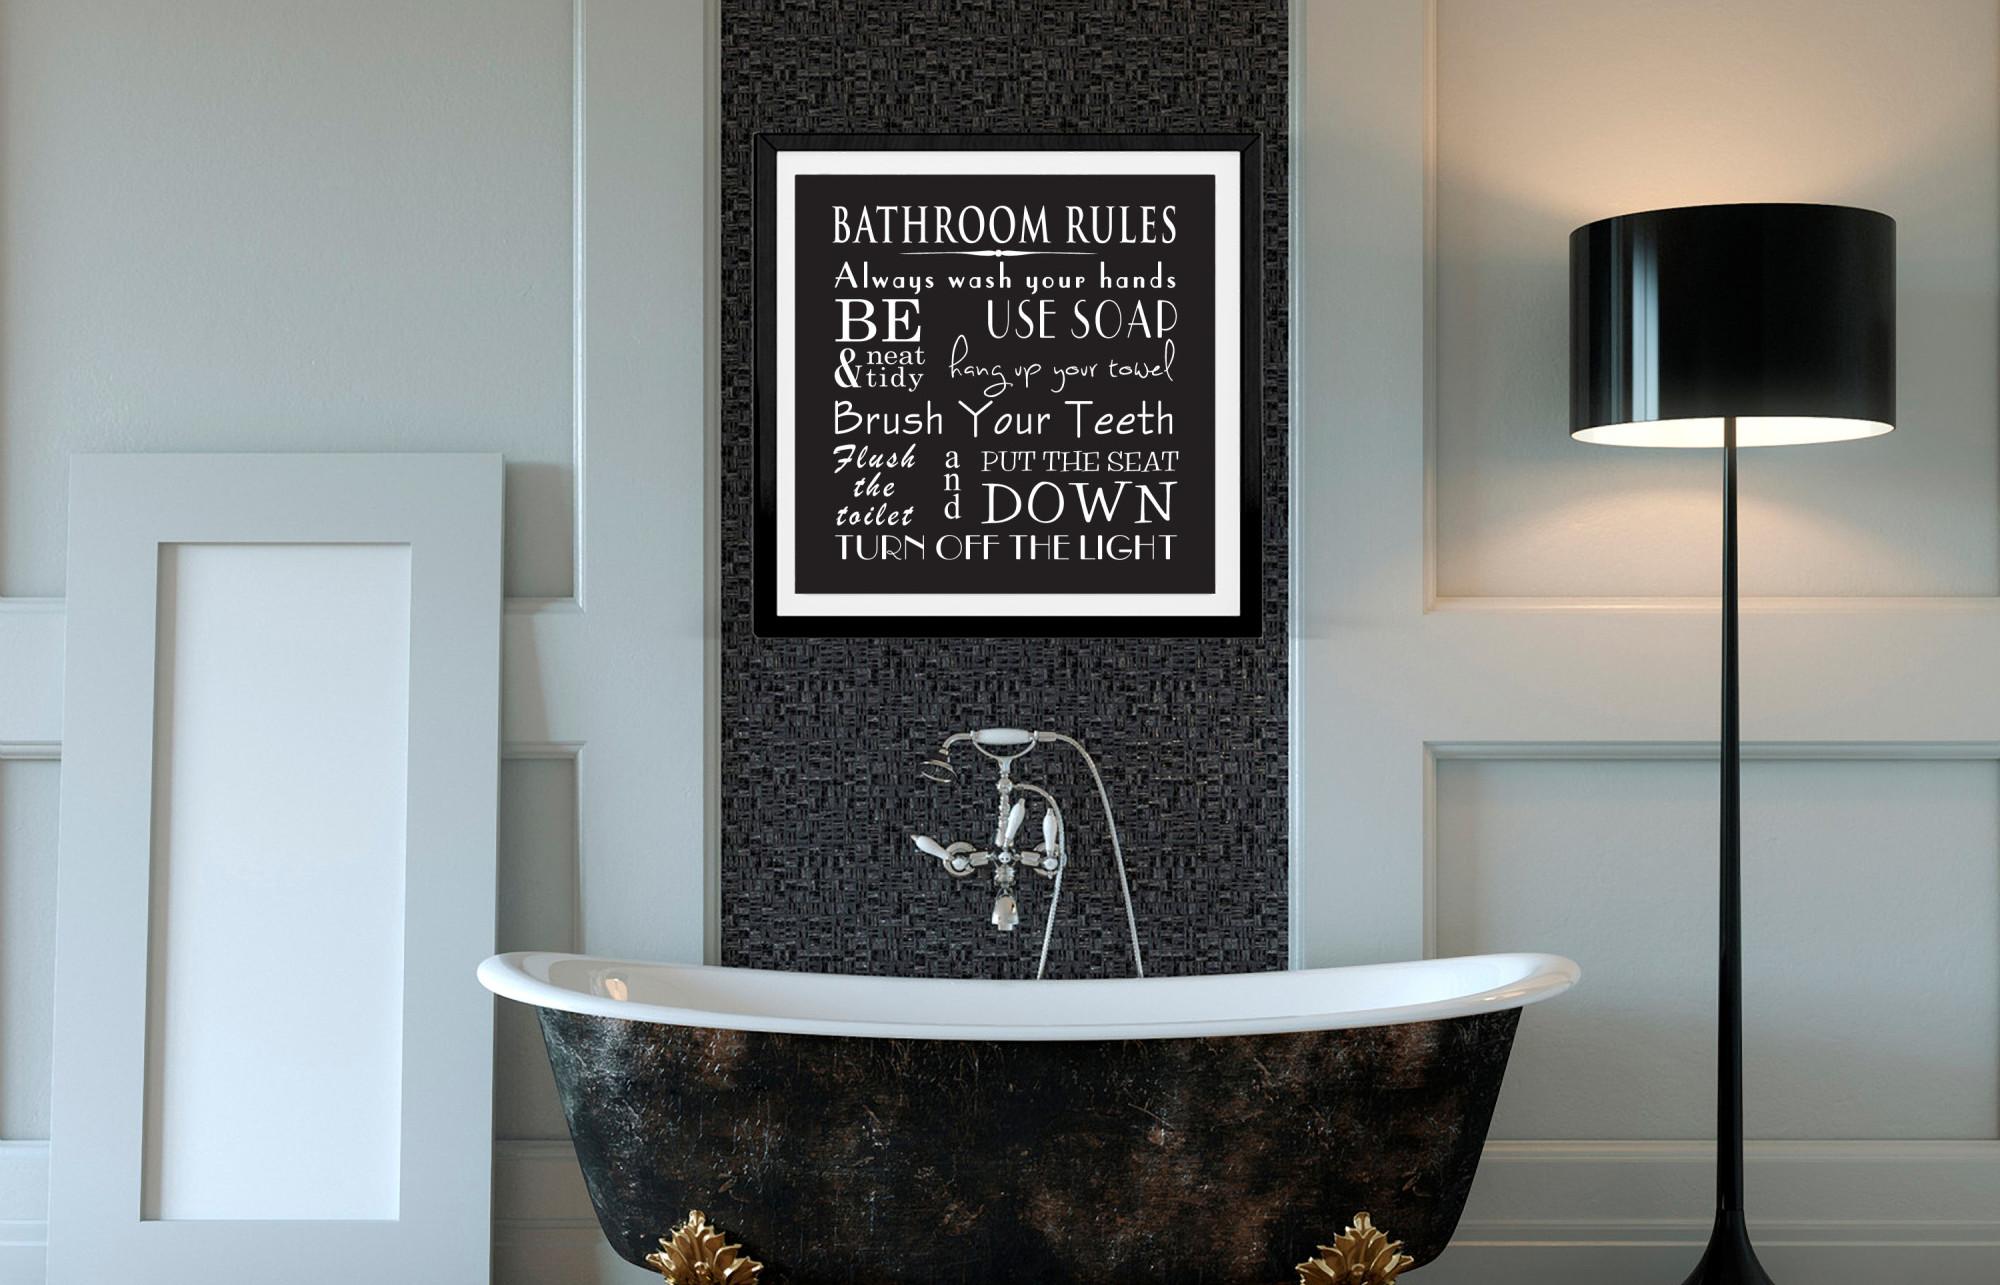 Bathroom-Rules-2-e1433901599535.jpg